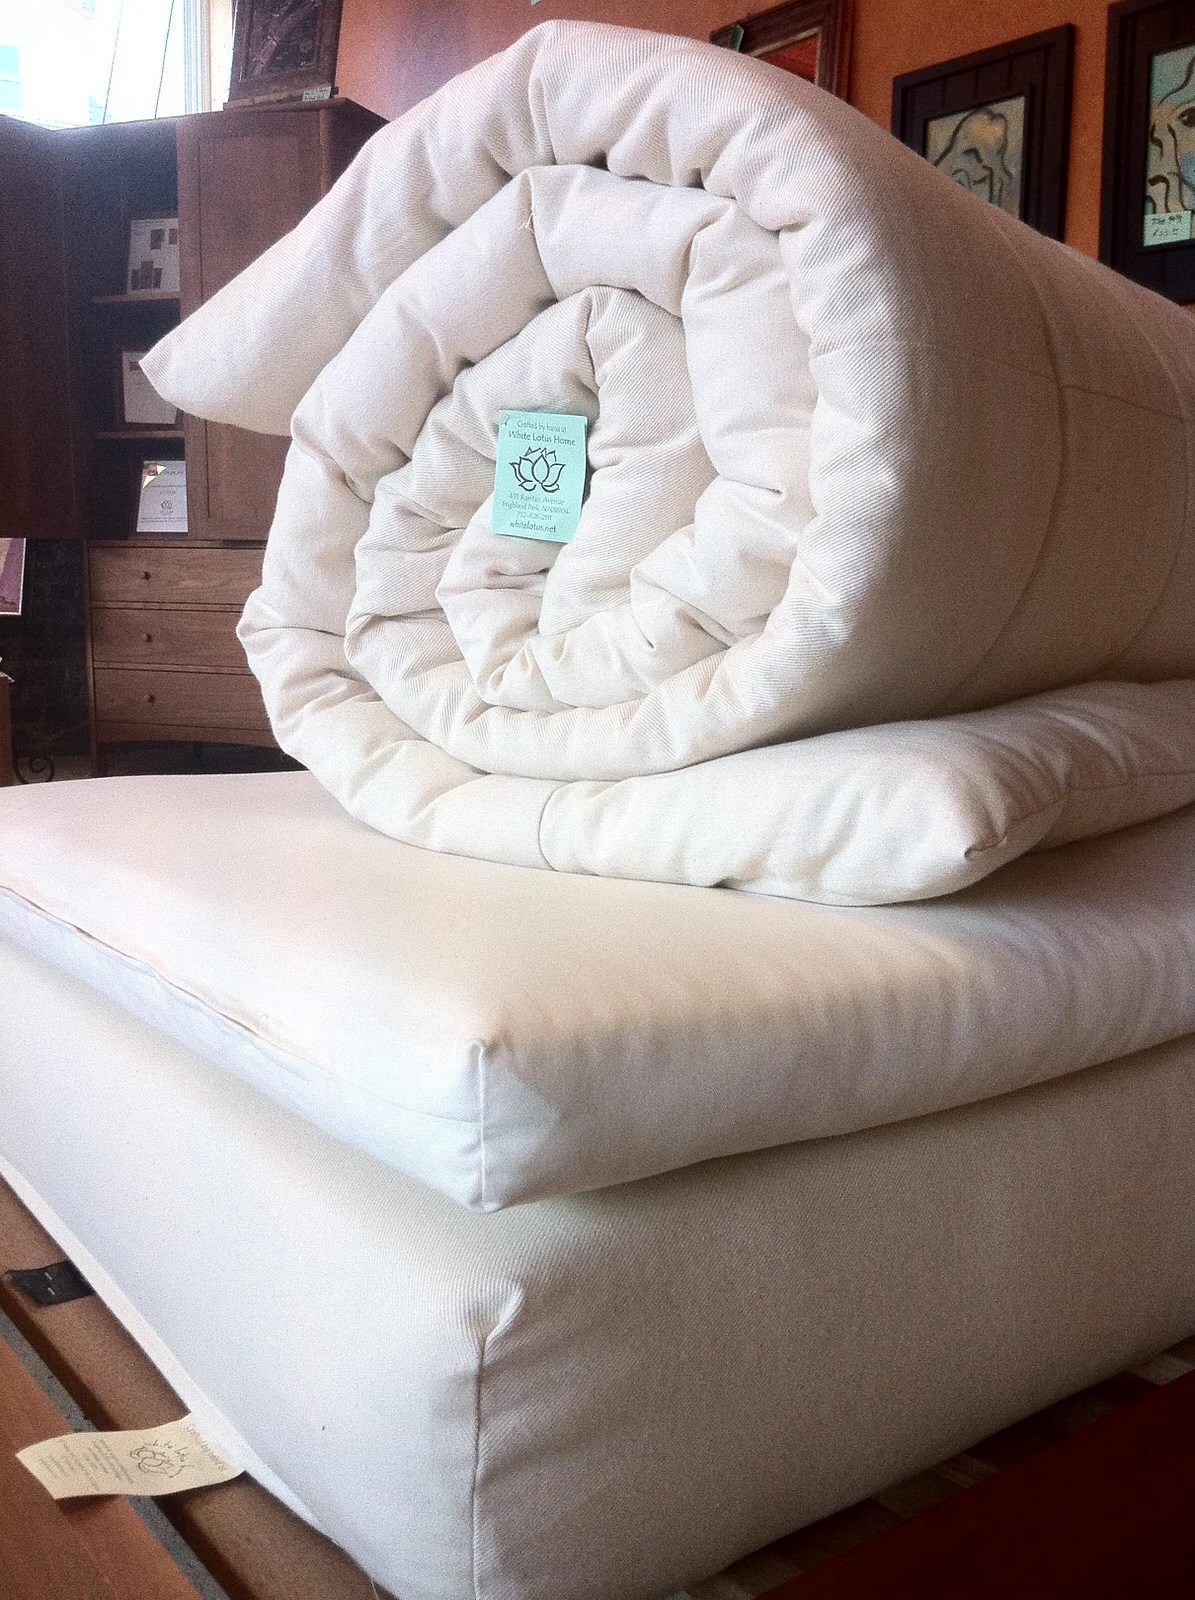 chair king sugar land barcalounger reclining chairs latex mattress lotus sleep system by white